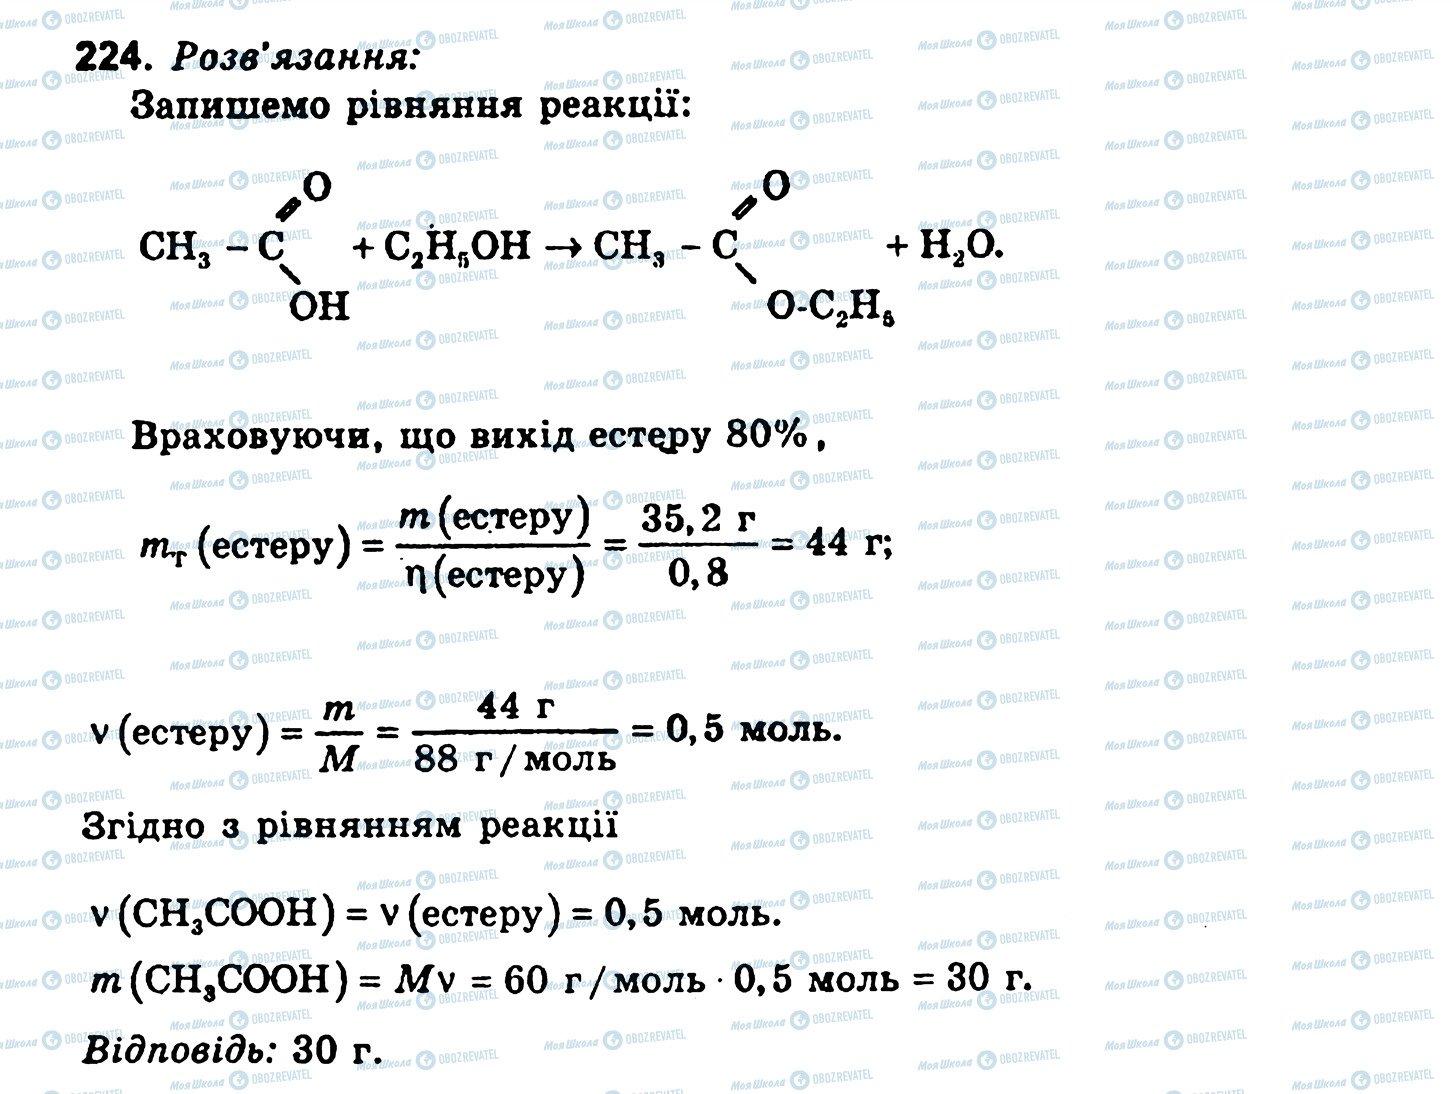 ГДЗ Химия 11 класс страница 224